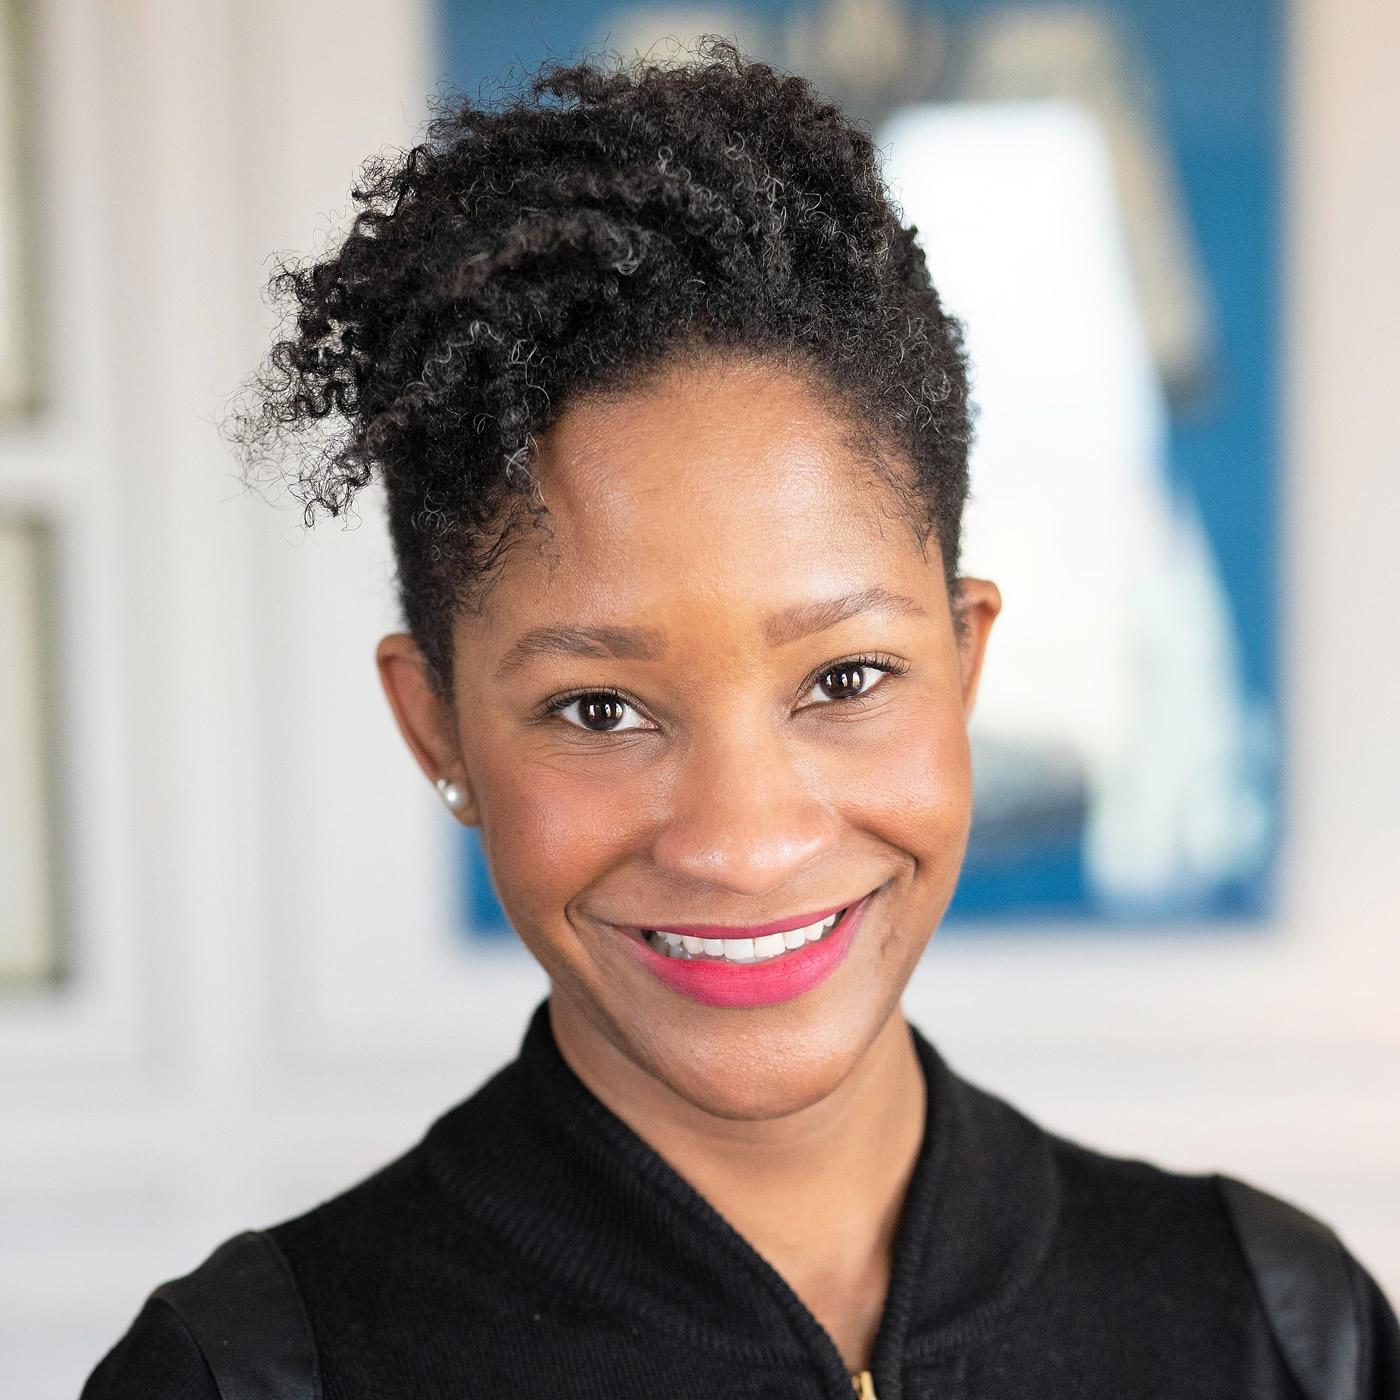 Drena Howard, Executive Director, Global Environmental, Health & Safety; The Estée Lauder Companies Inc.